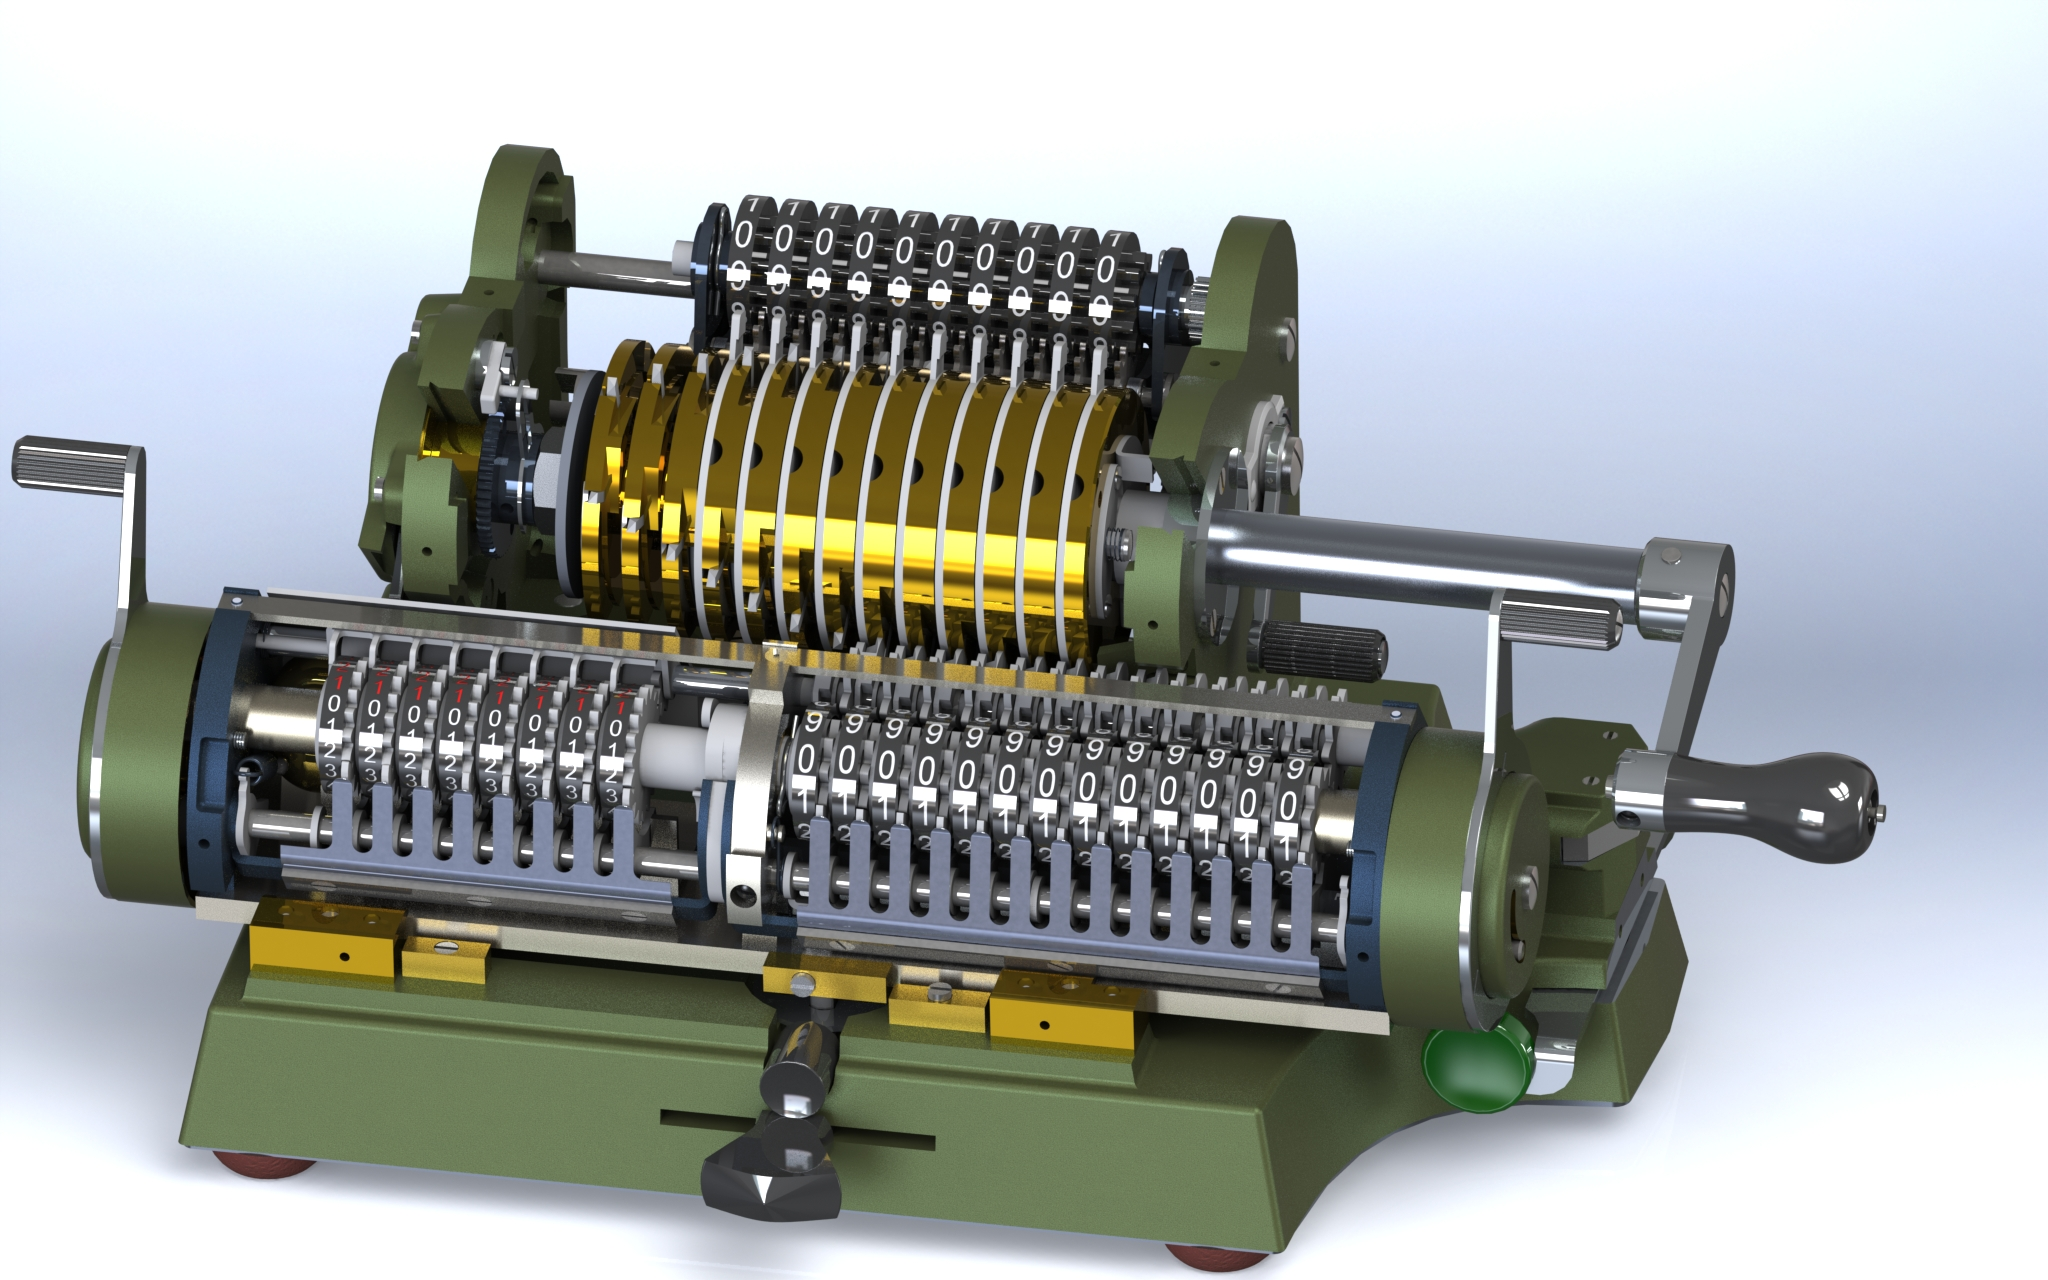 Antares p6意大利机械式计算器3D模型图纸 Solidworks设计 附STEP